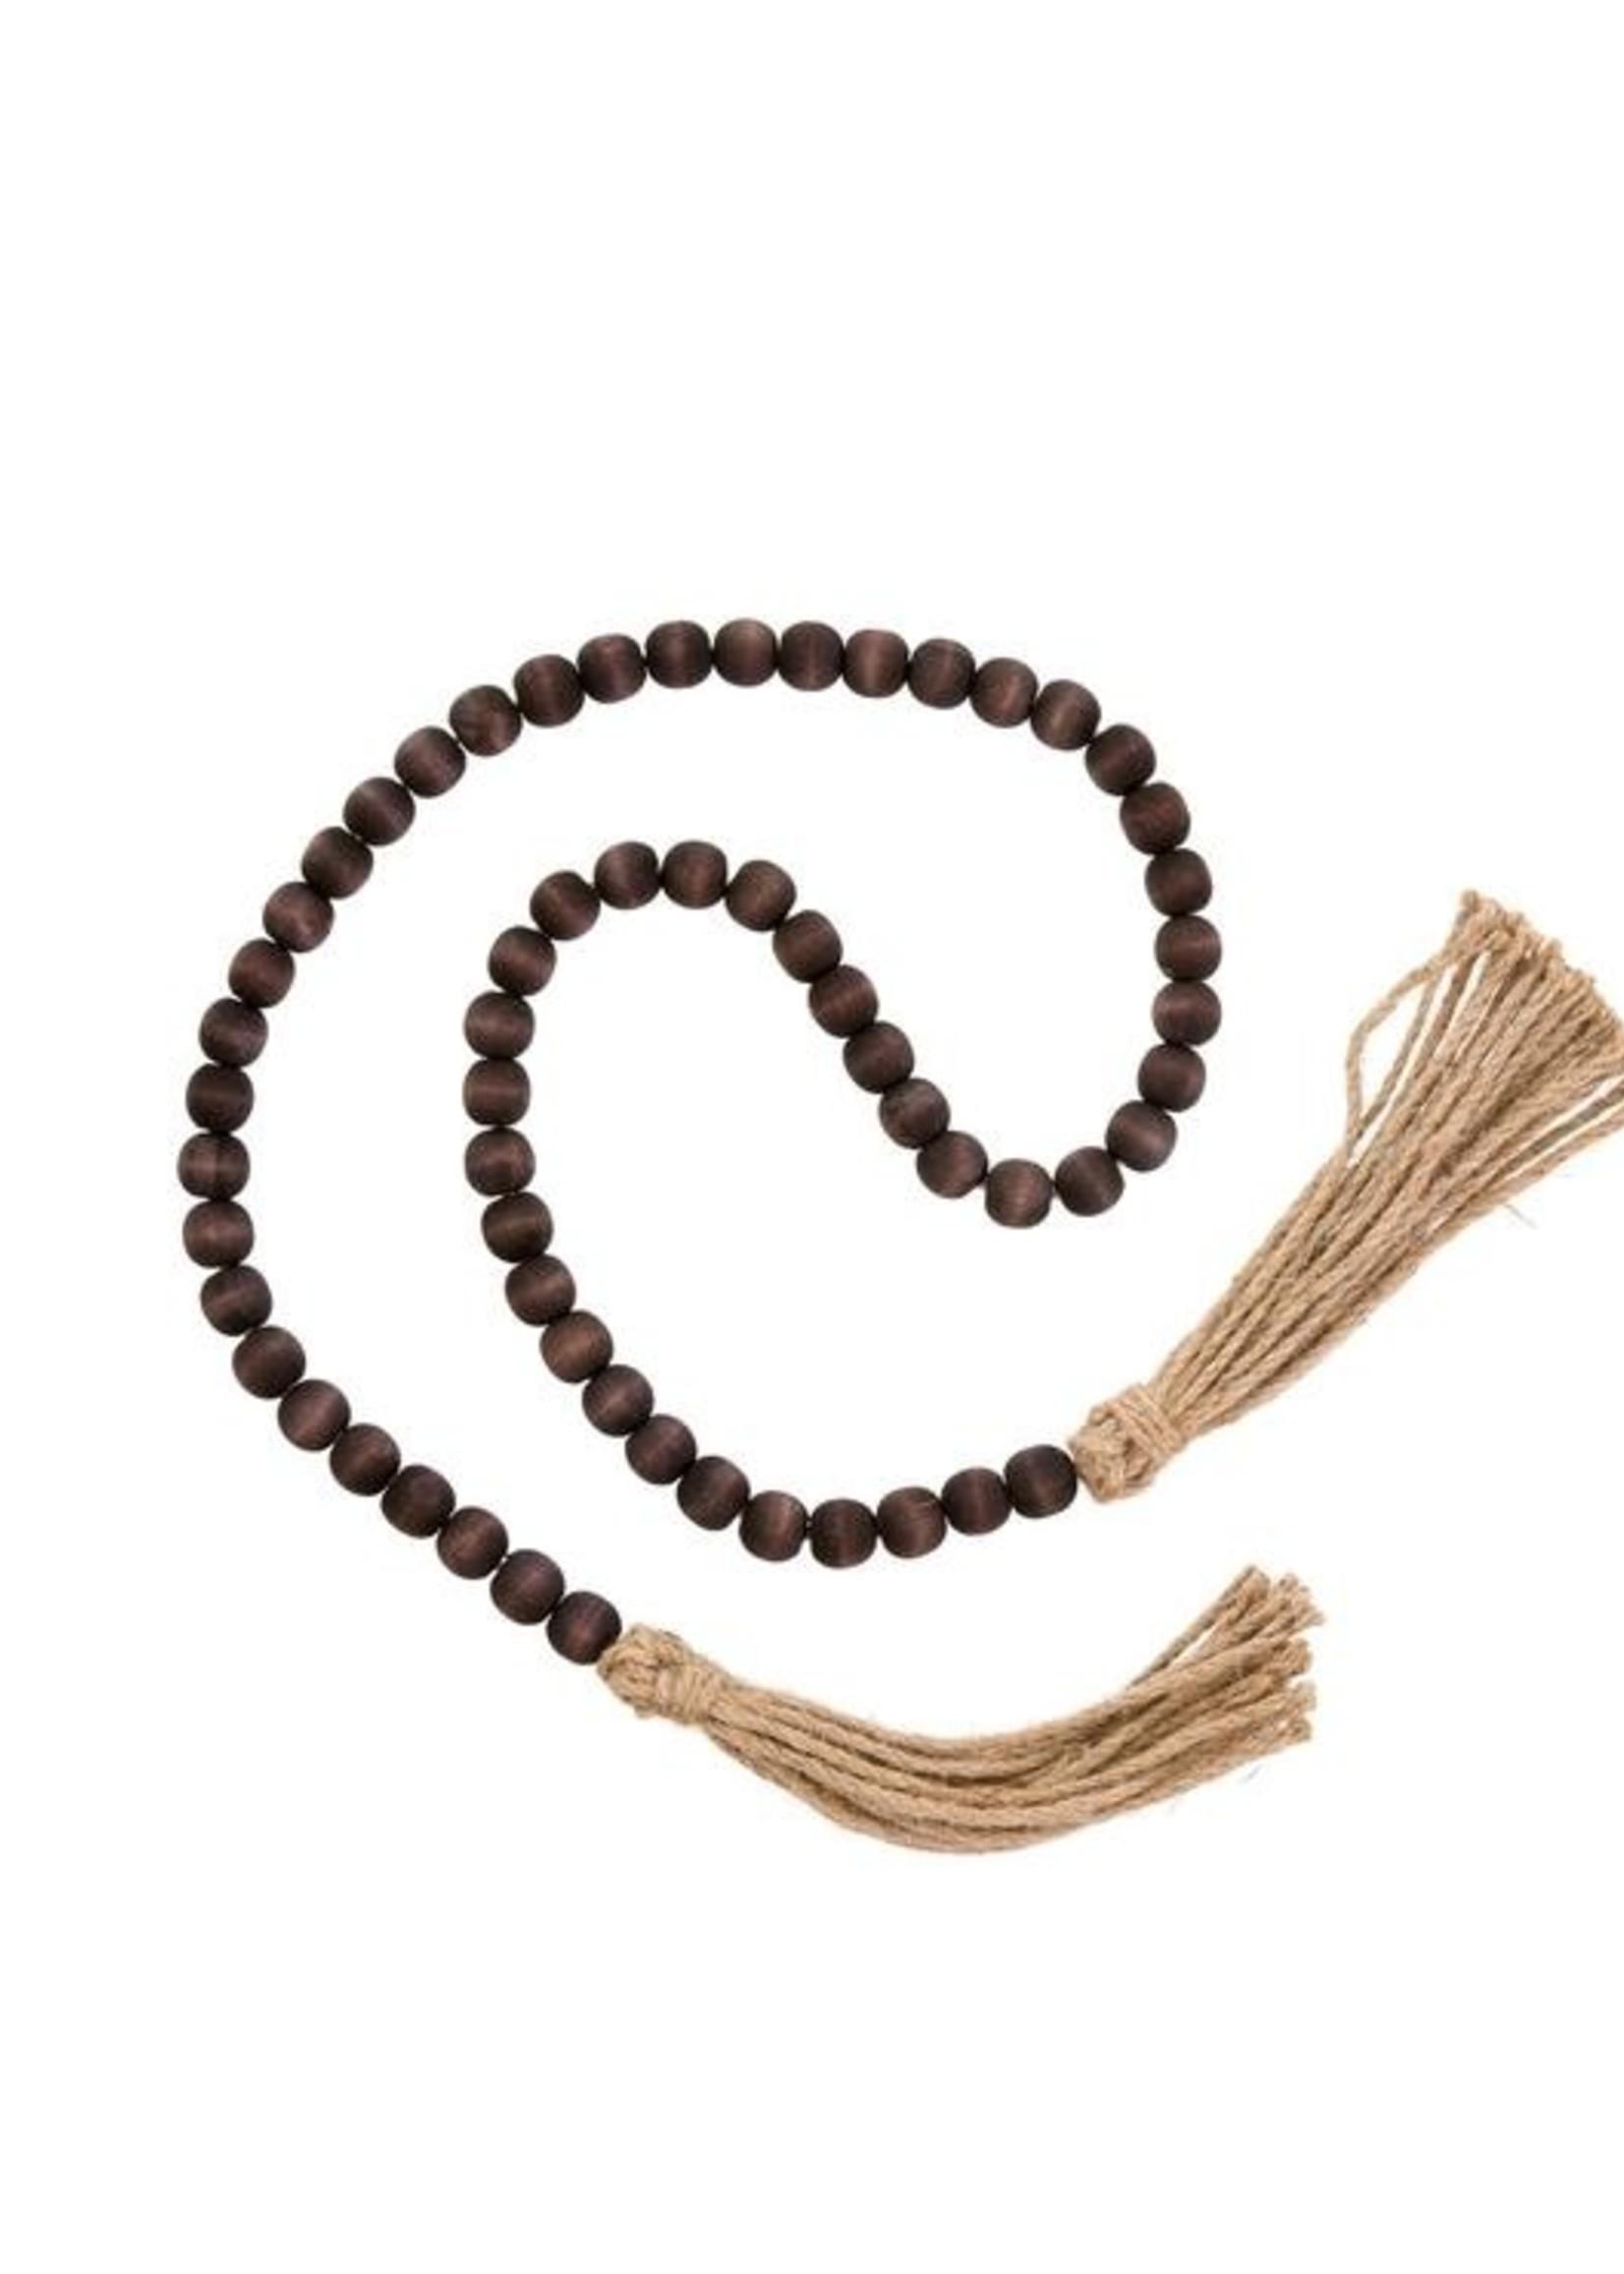 Indaba Trading Co Tassel Prayer Beads | Brown